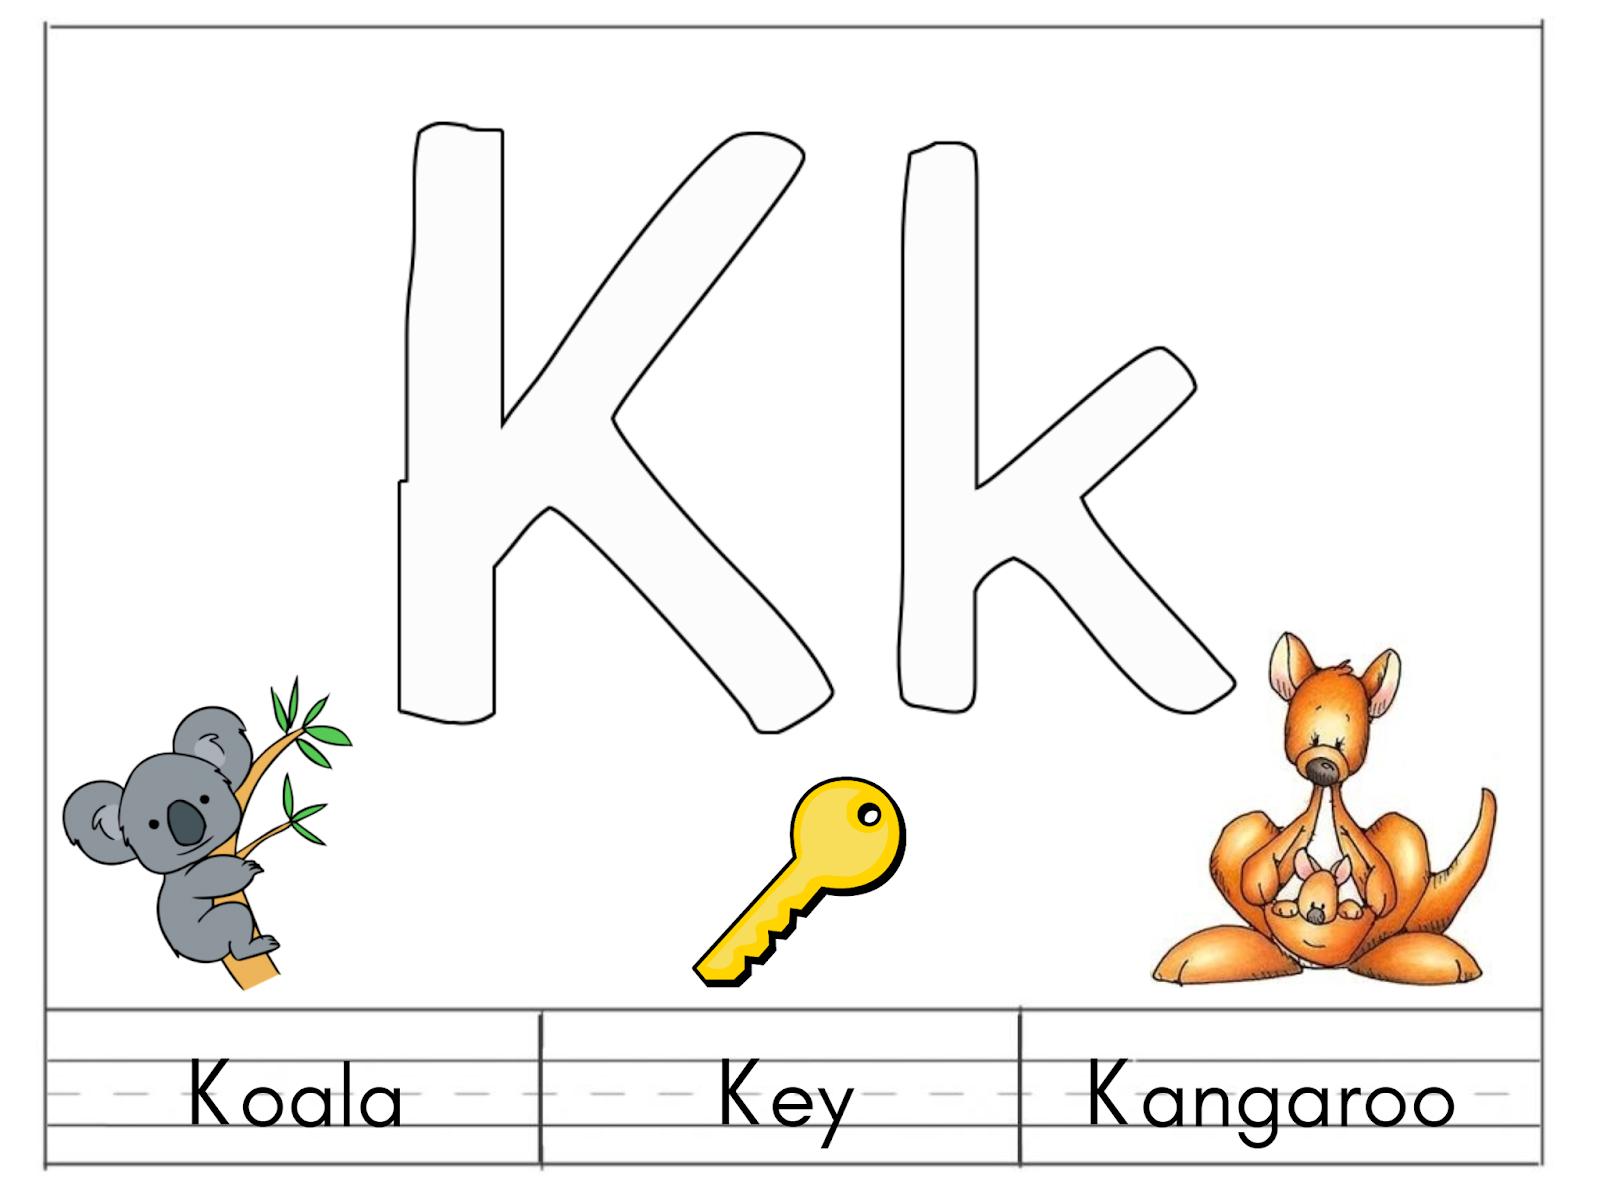 صورة كلمات بحرف k , صور و كلمات مزخرفه بحرف k